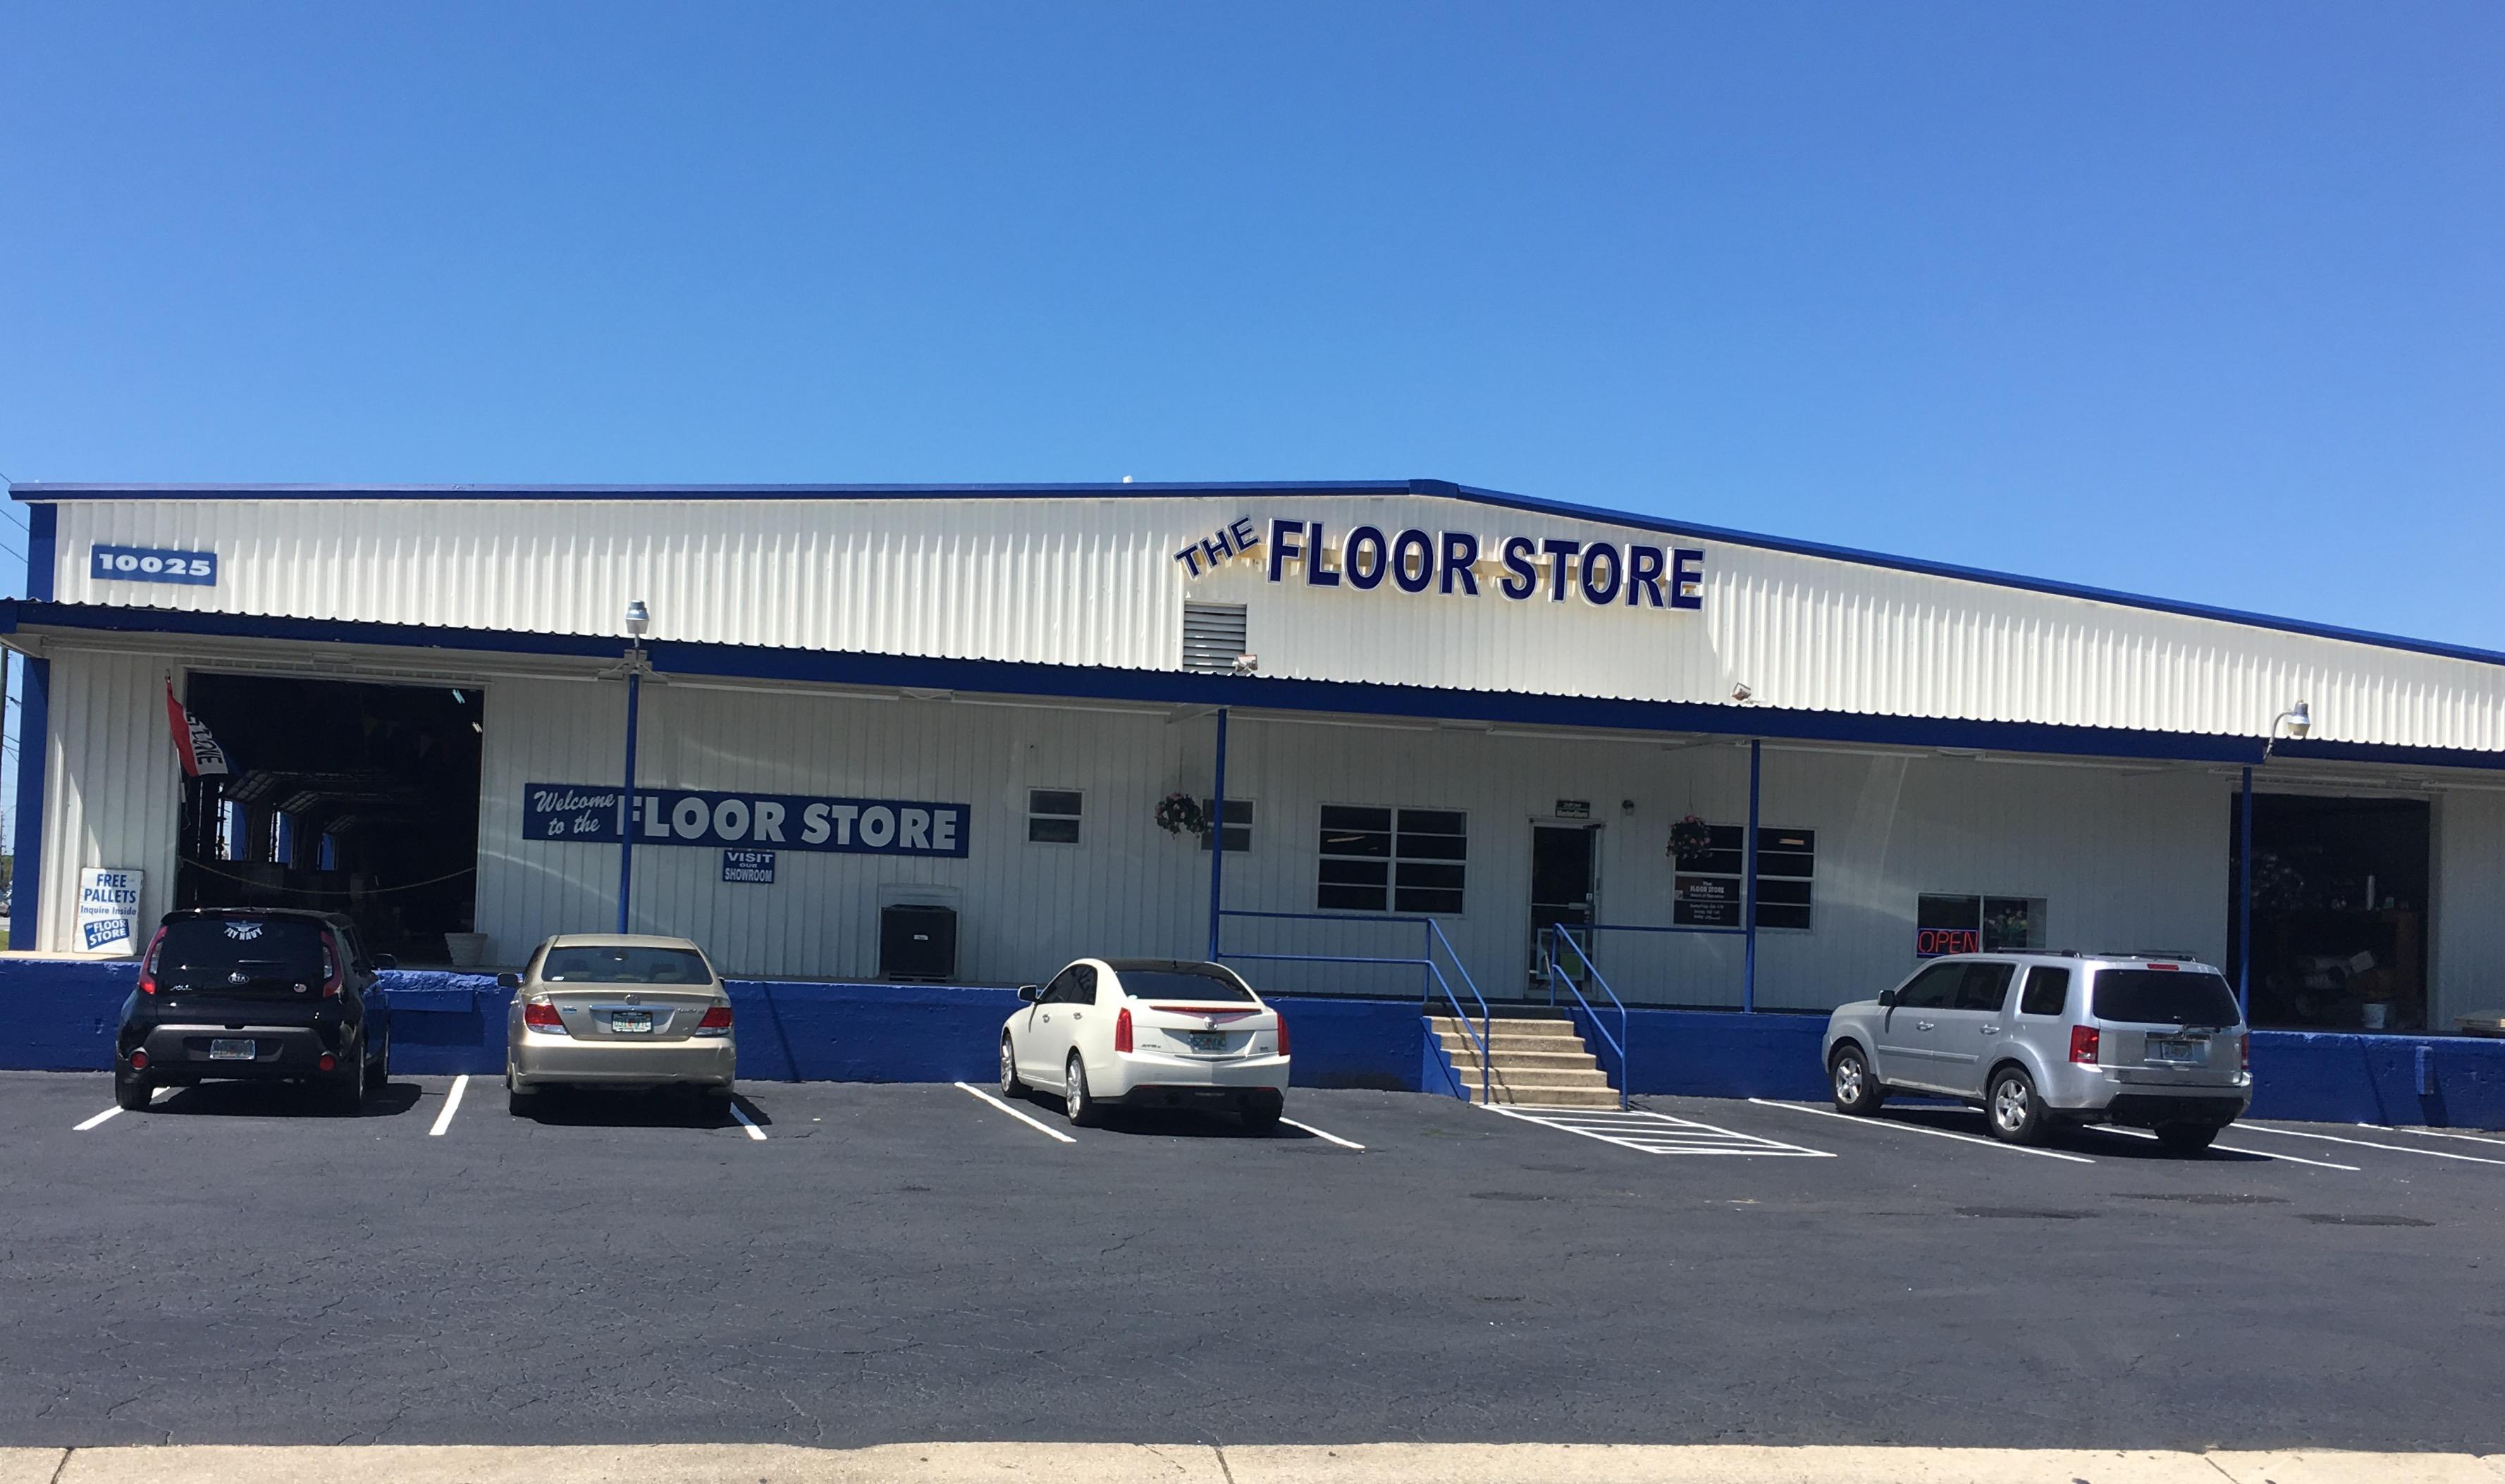 THE FLOOR STORE - 10025 Ulmerton Rd, Largo, FL 33771